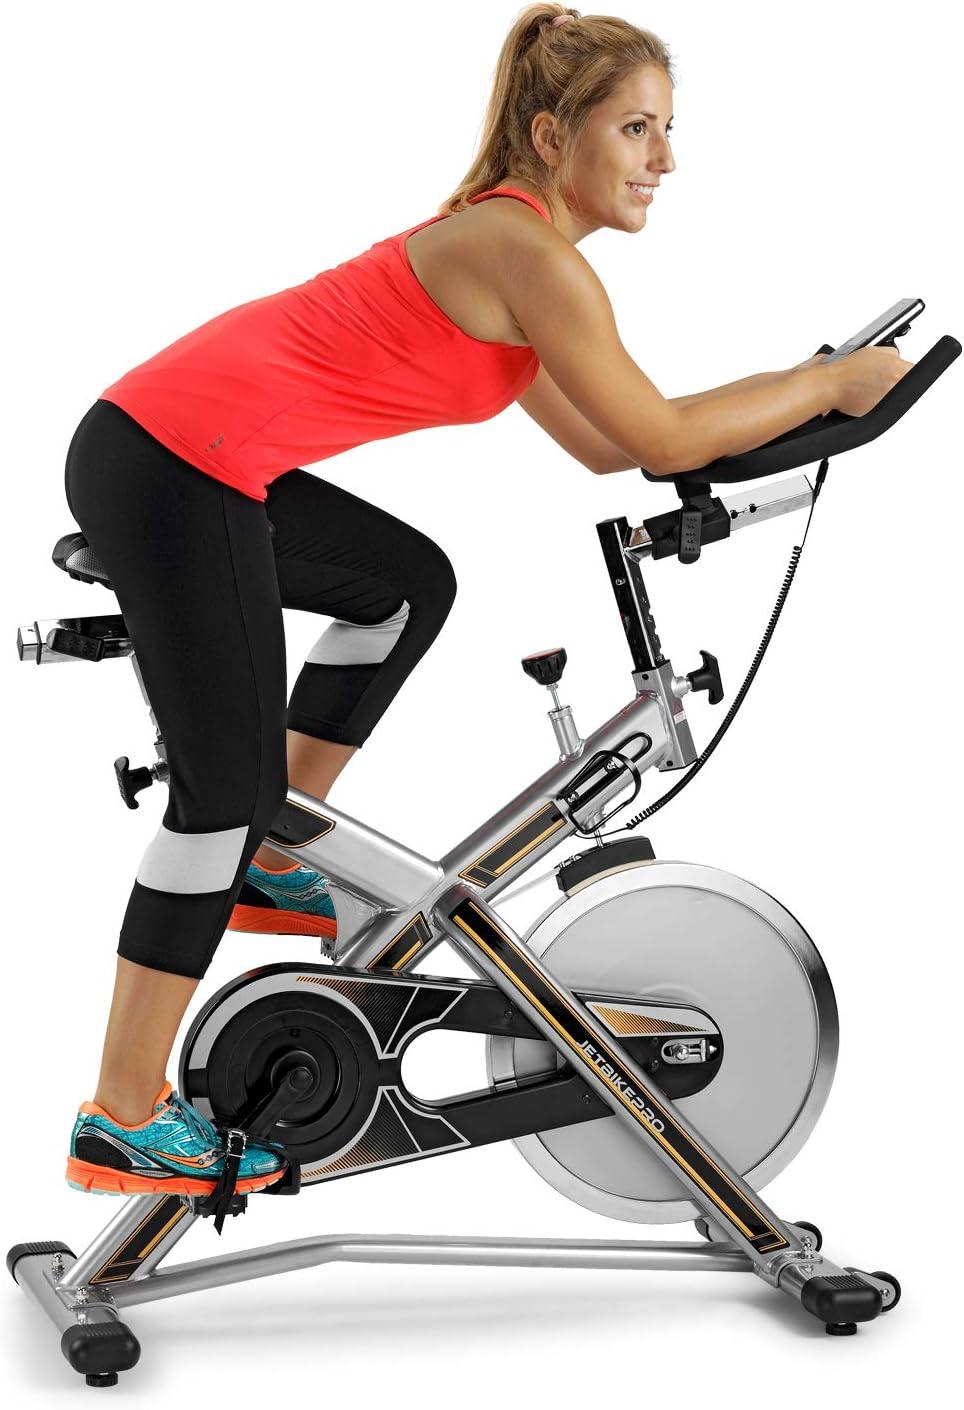 BH Fitness MKT Jetbike Pro Bicicleta Ciclismo Indoor, Unisex ...